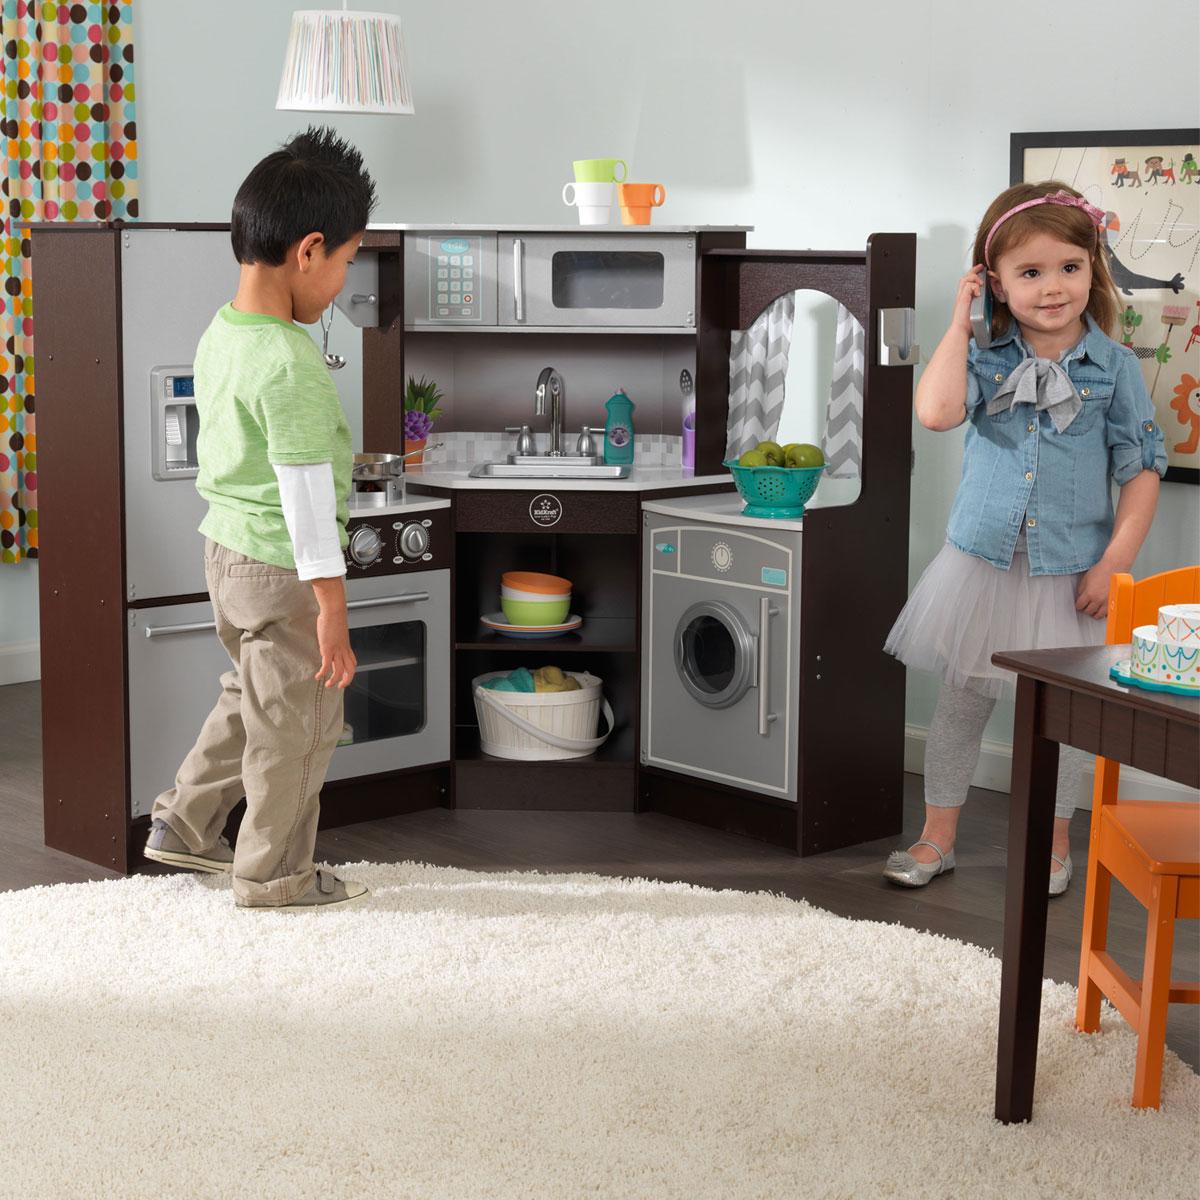 KidKraft Ulitmate Corner Play Kitchen w/lights and sounds - 53365